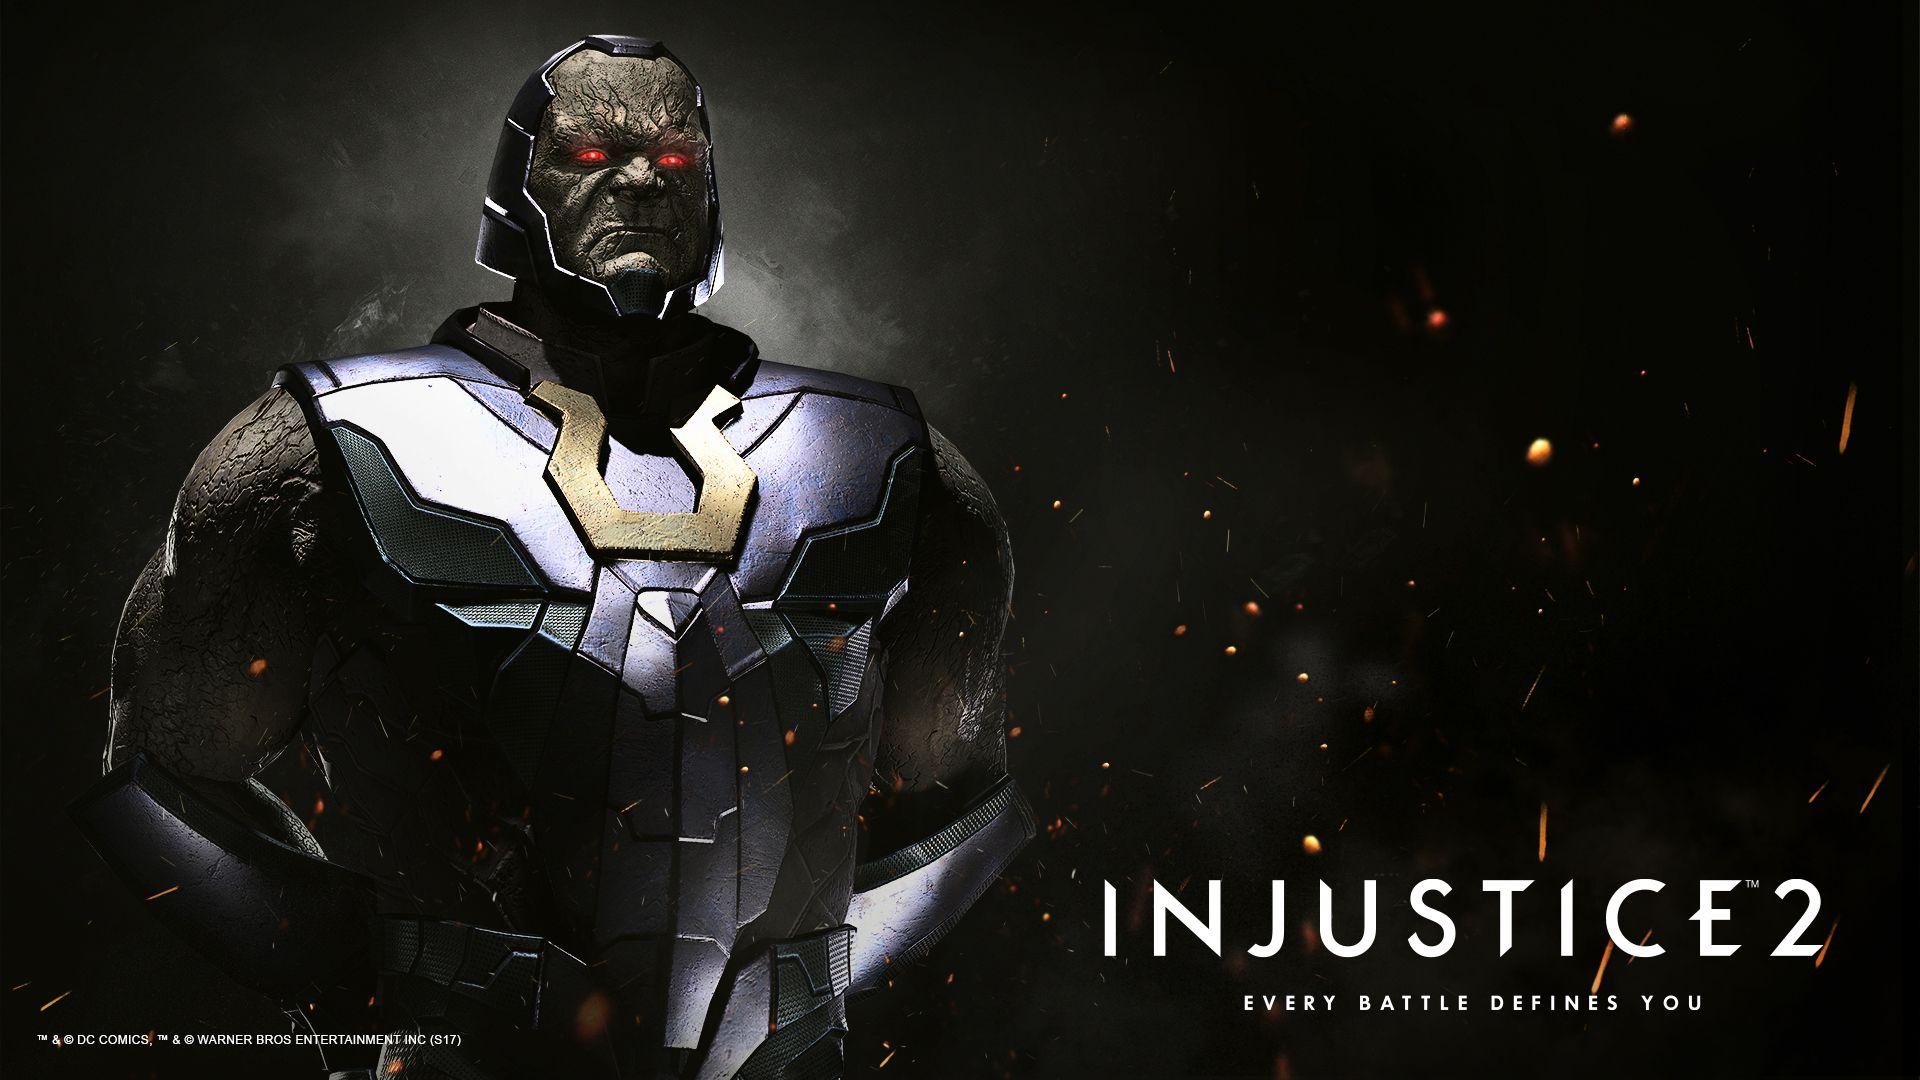 Image injustice2 darkseid wallpaper 1920x1080 22g injustice injustice2 darkseid wallpaper 1920x1080 22g voltagebd Choice Image